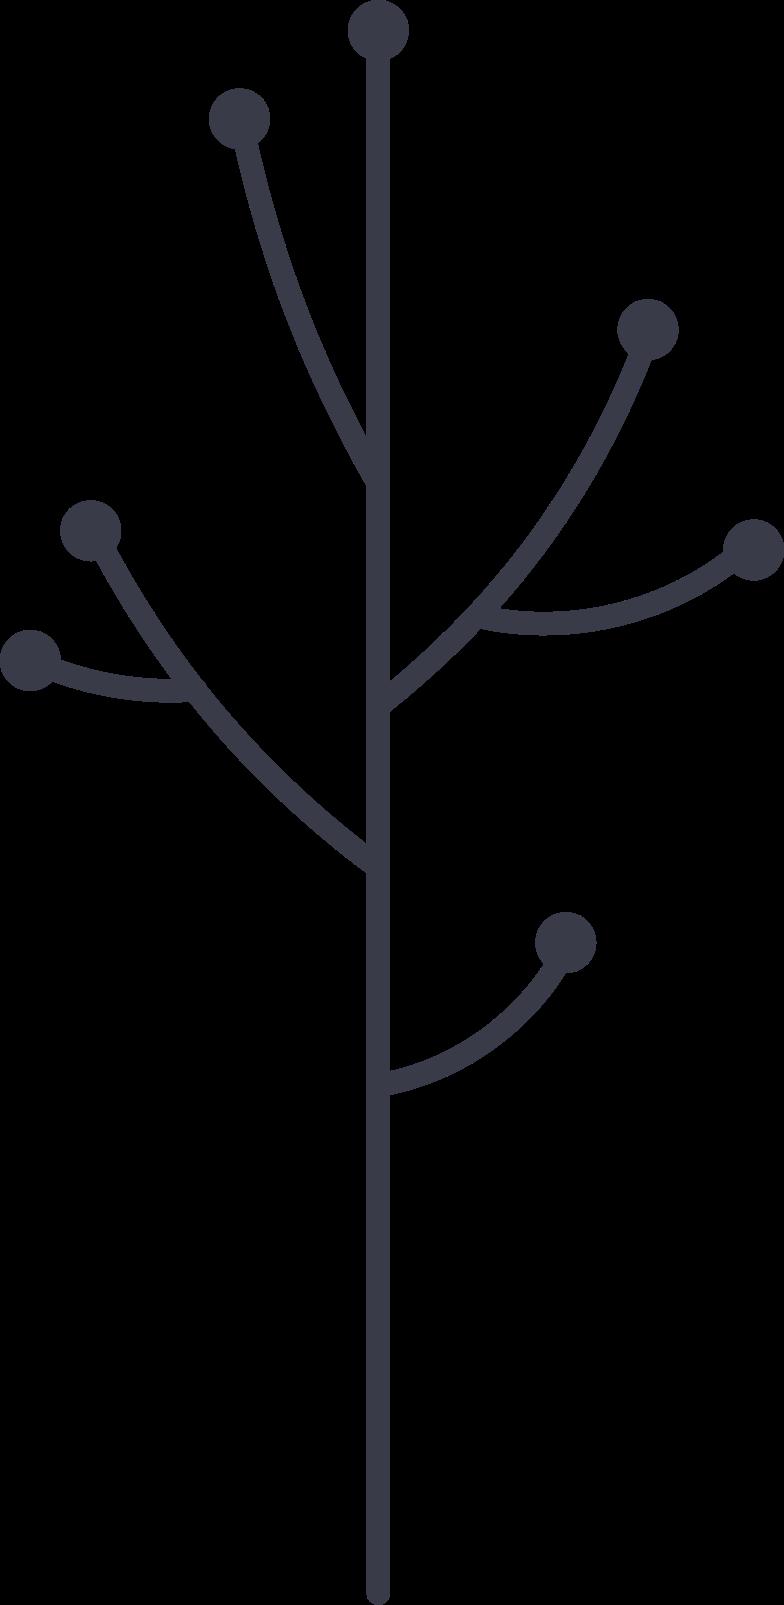 twig Clipart illustration in PNG, SVG